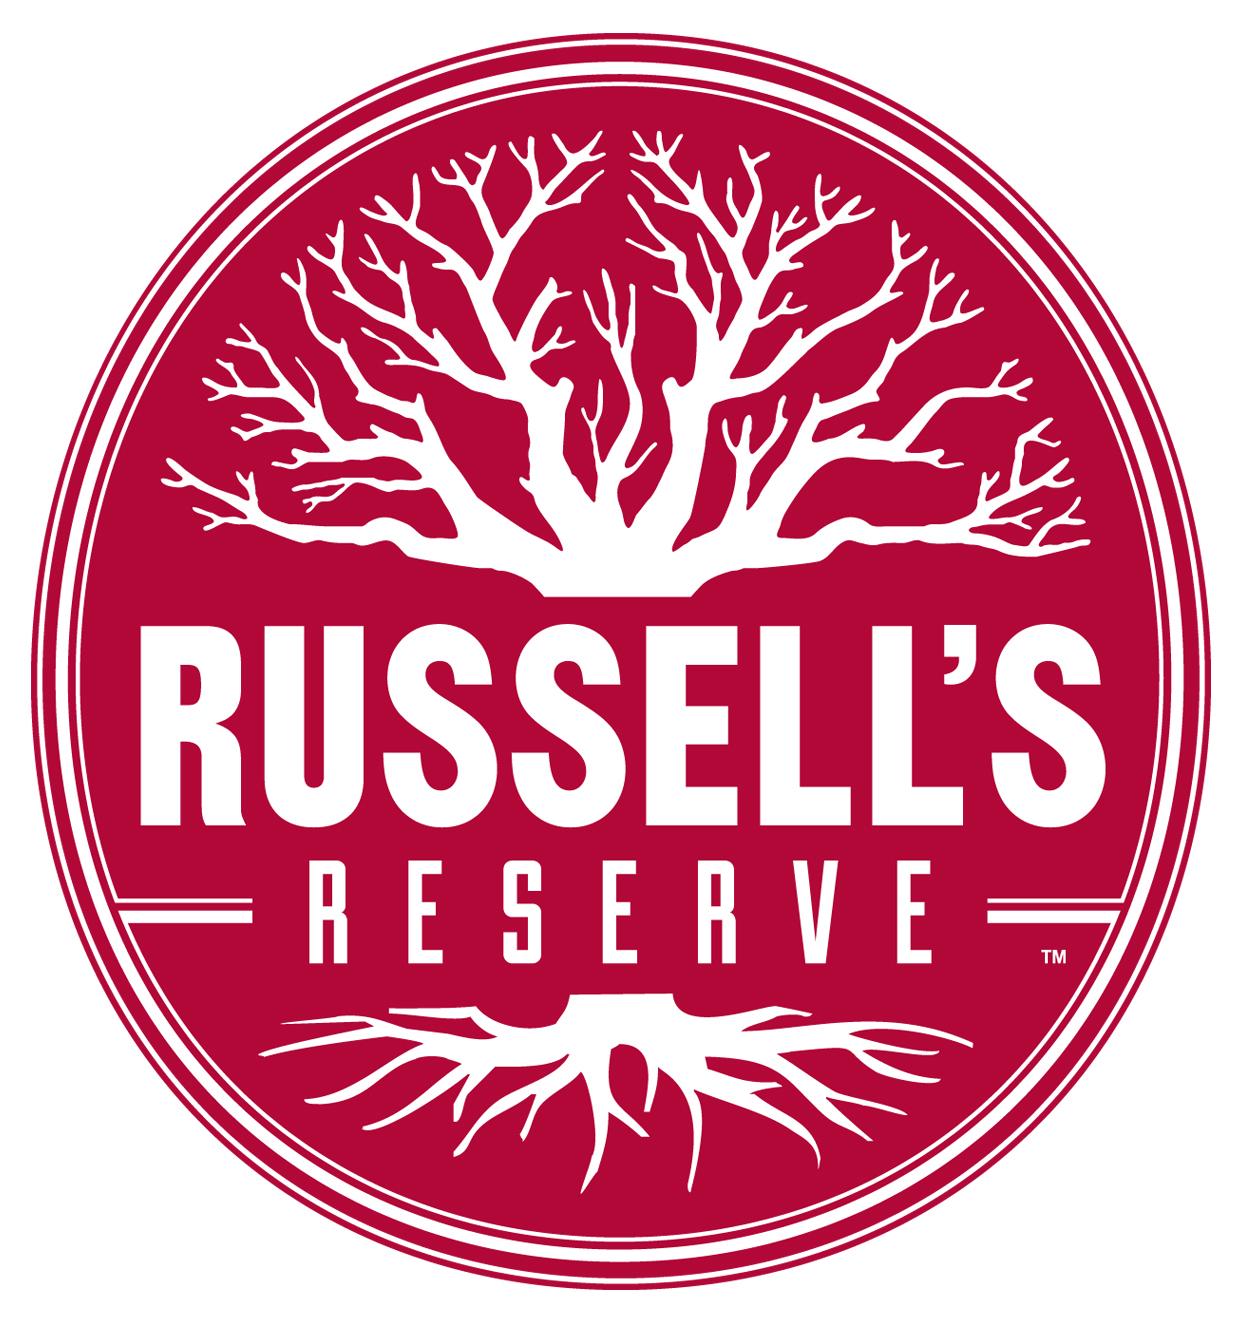 Russells-Reserve-Bourbon-Red---Logo - Justin Frumkes.jpg